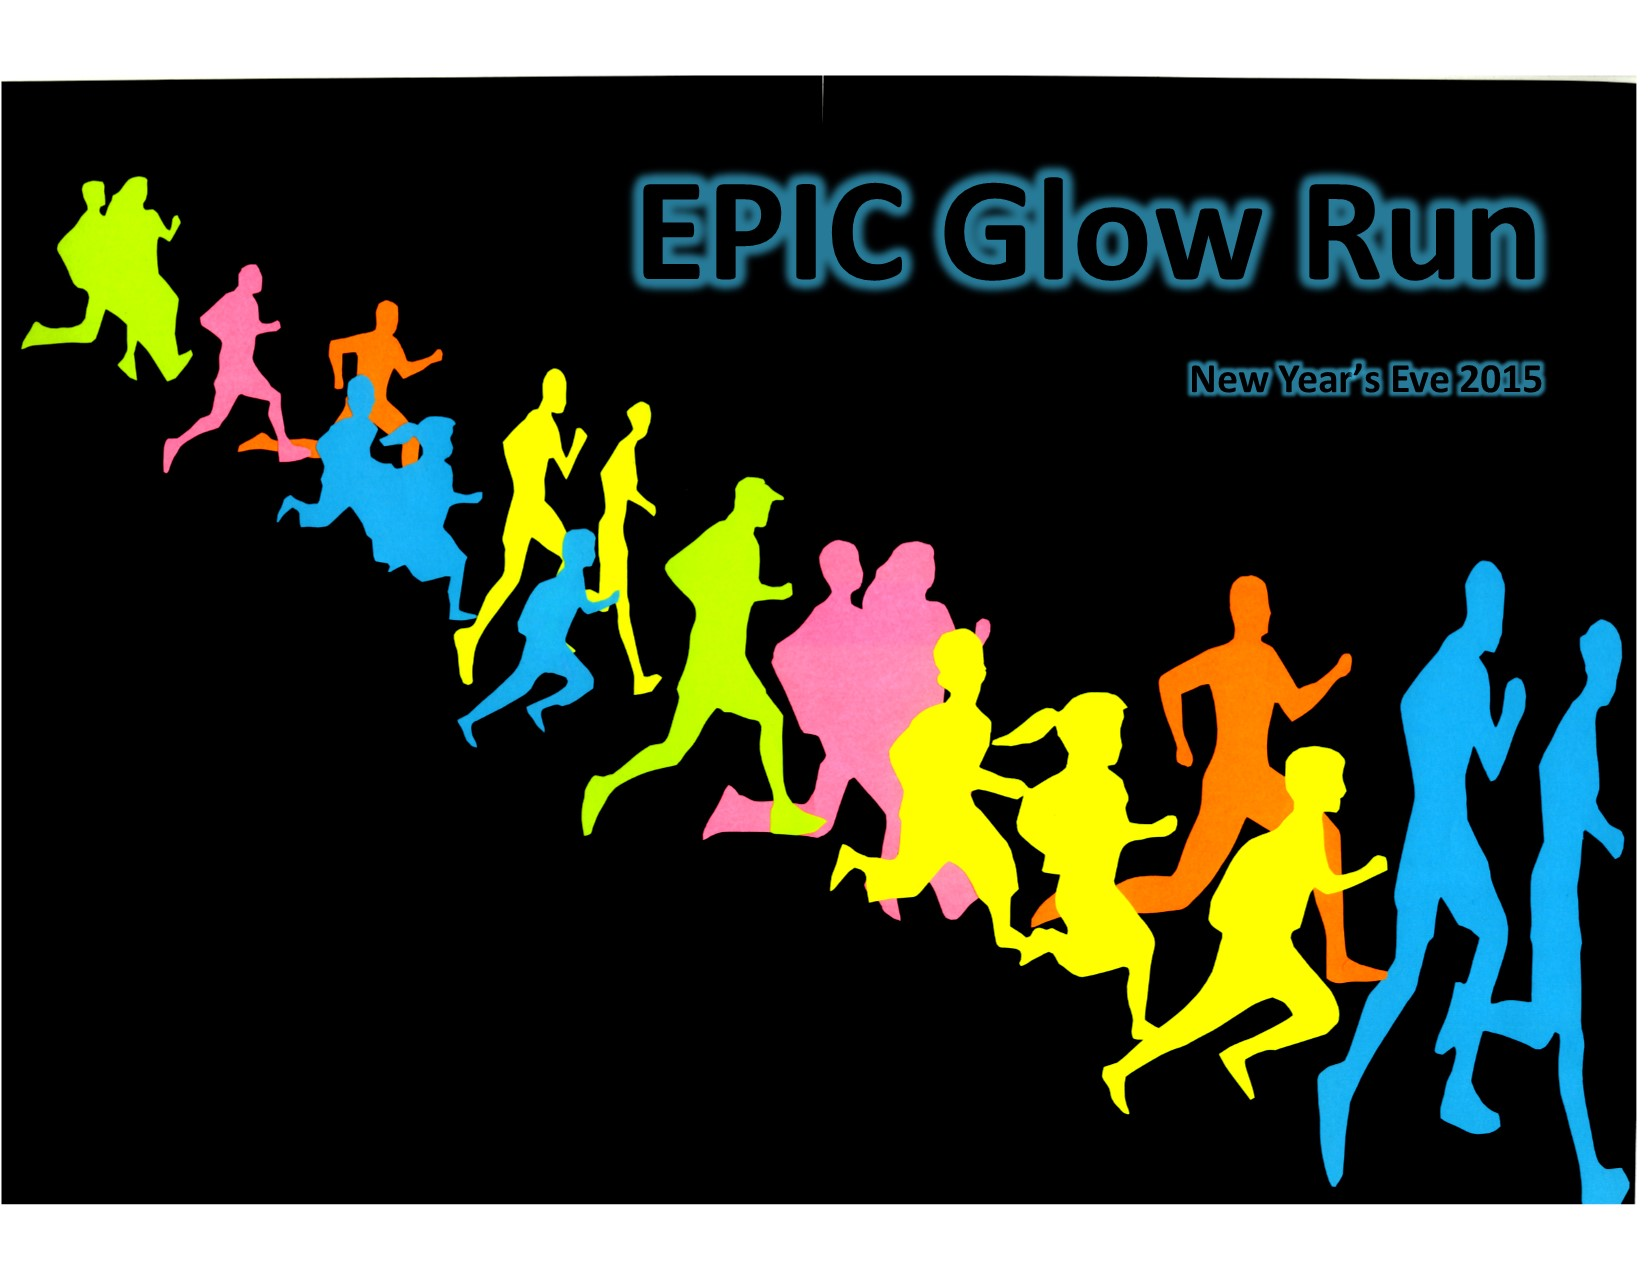 EPIC Glow 2015